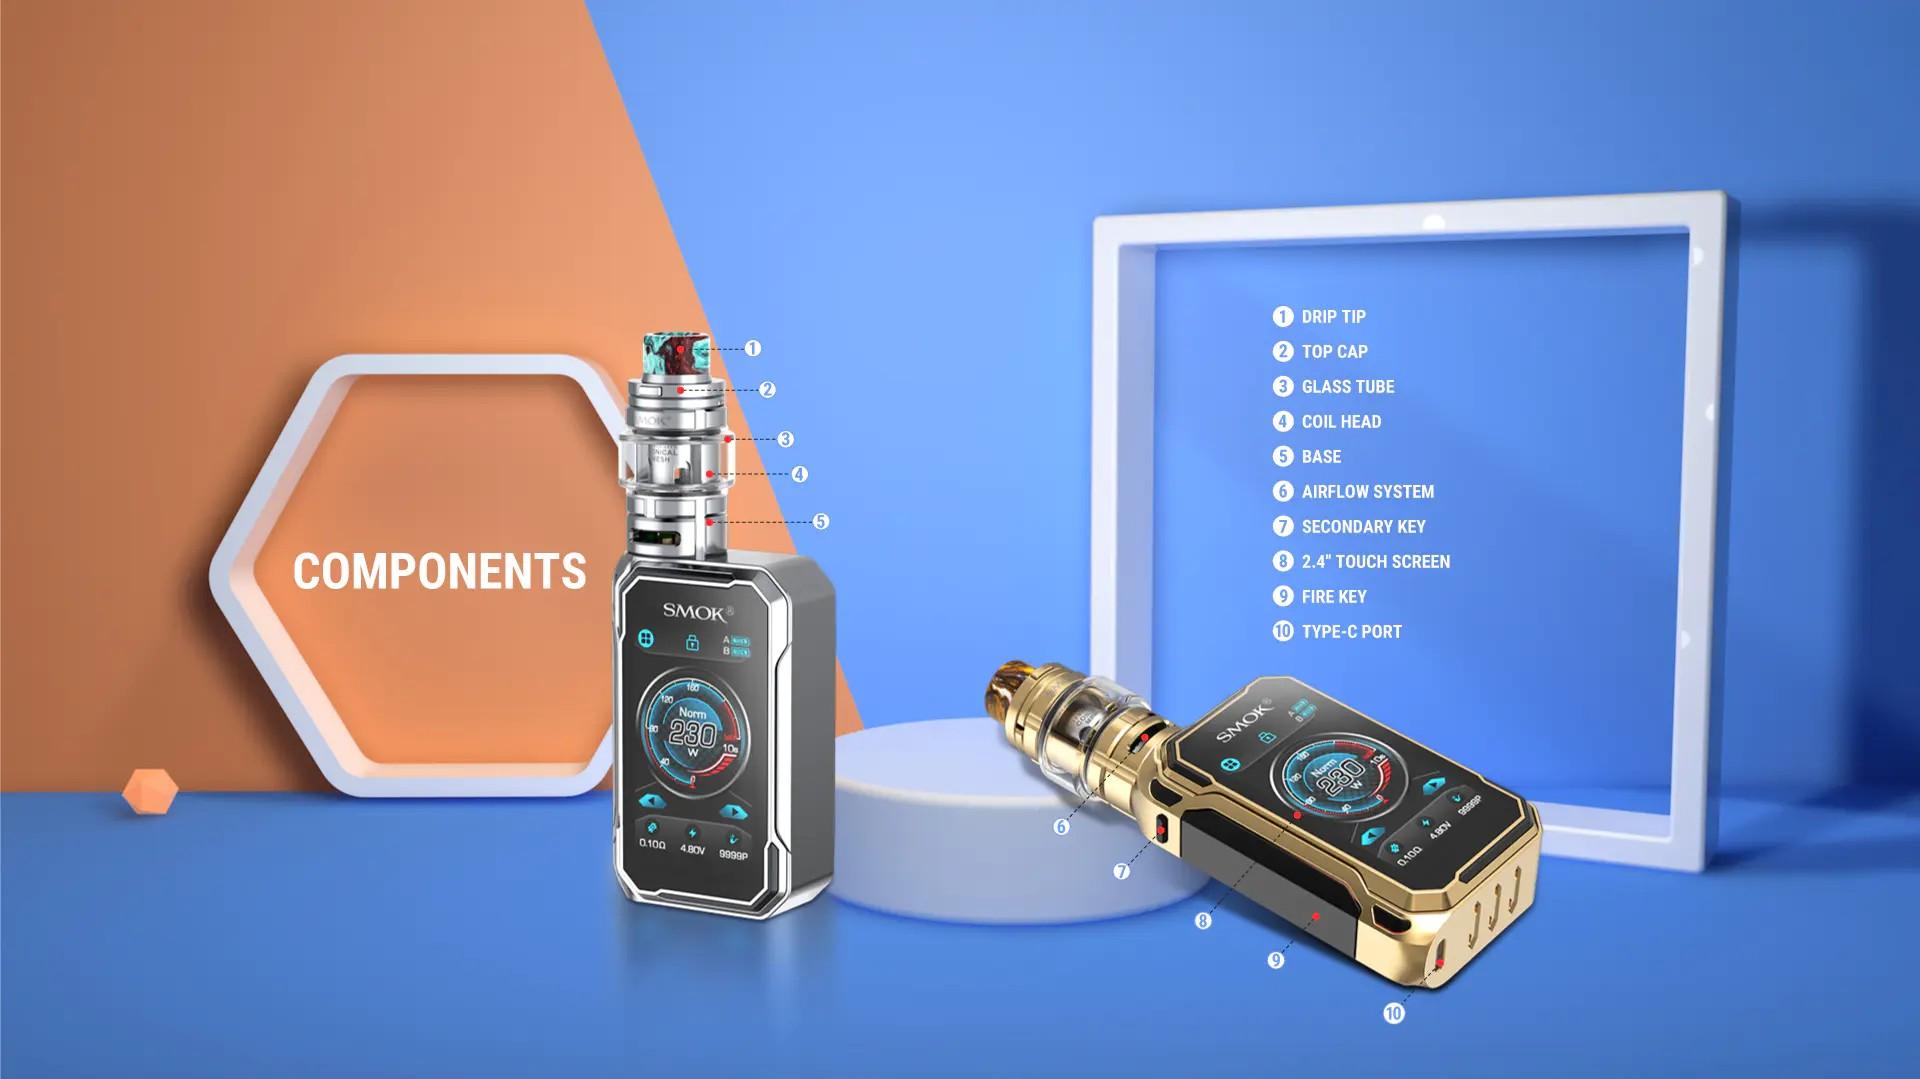 Smok G Priv 3 components